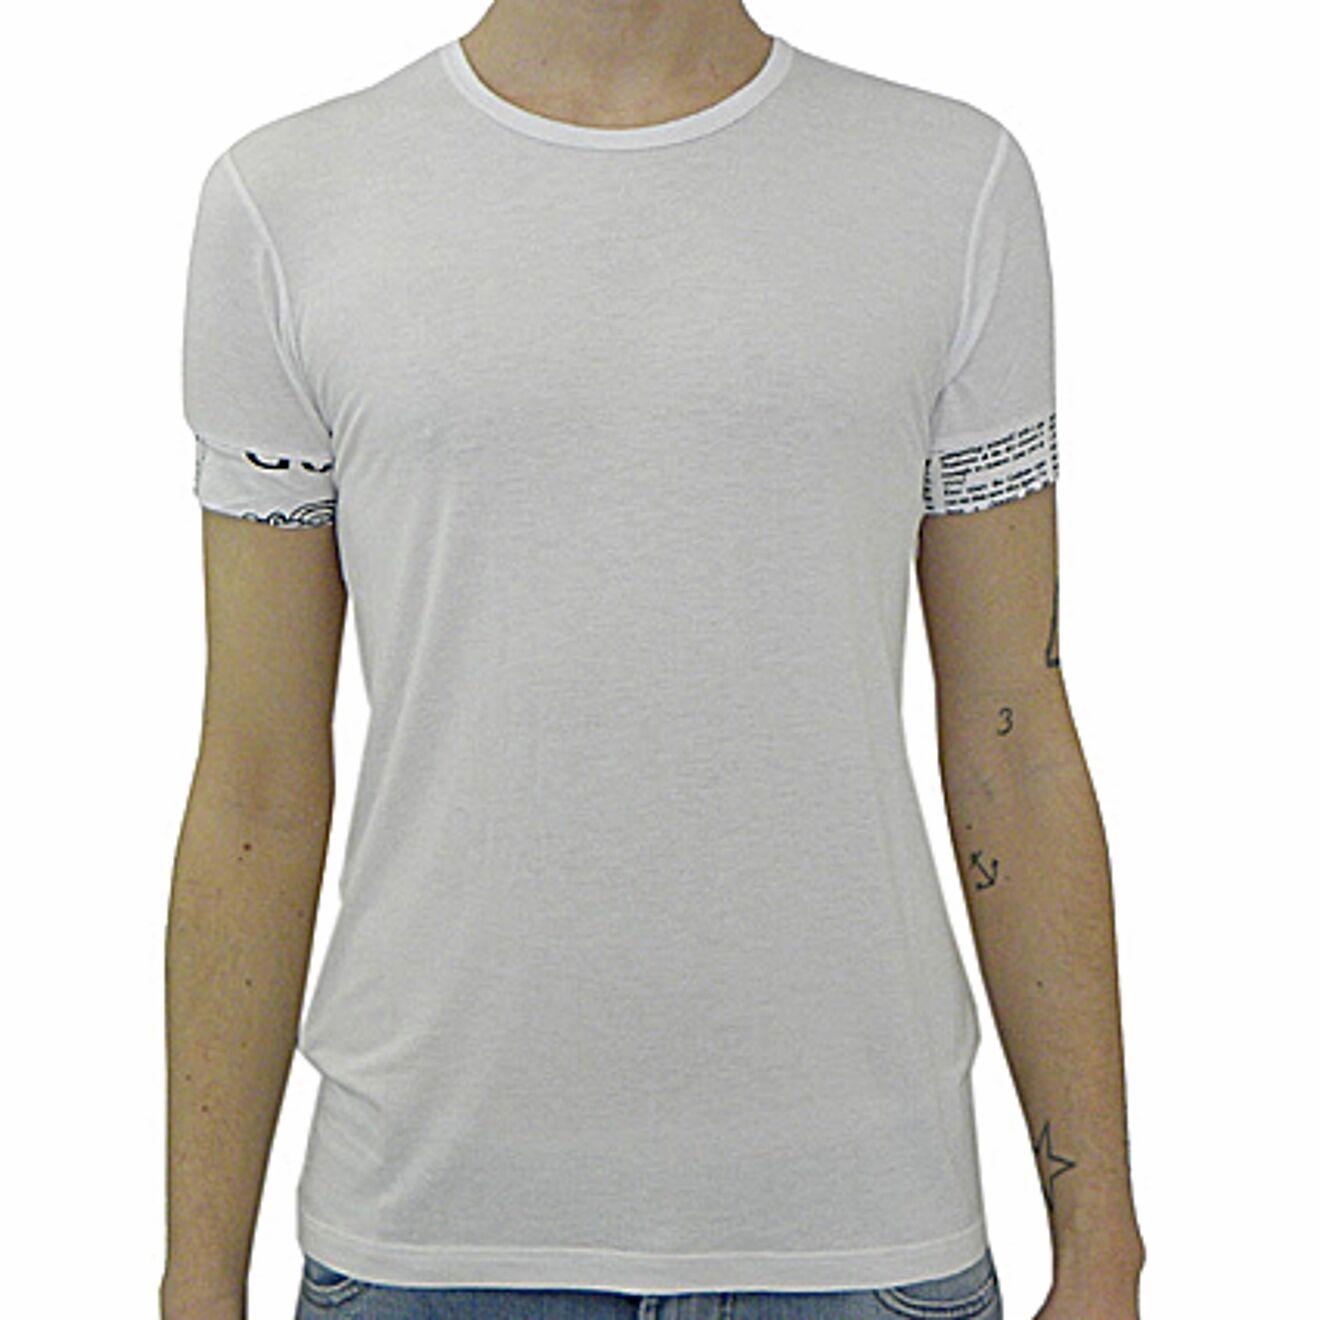 John Galliano T-shirt sleeve lapel gazette, t-shirt lapel gazette